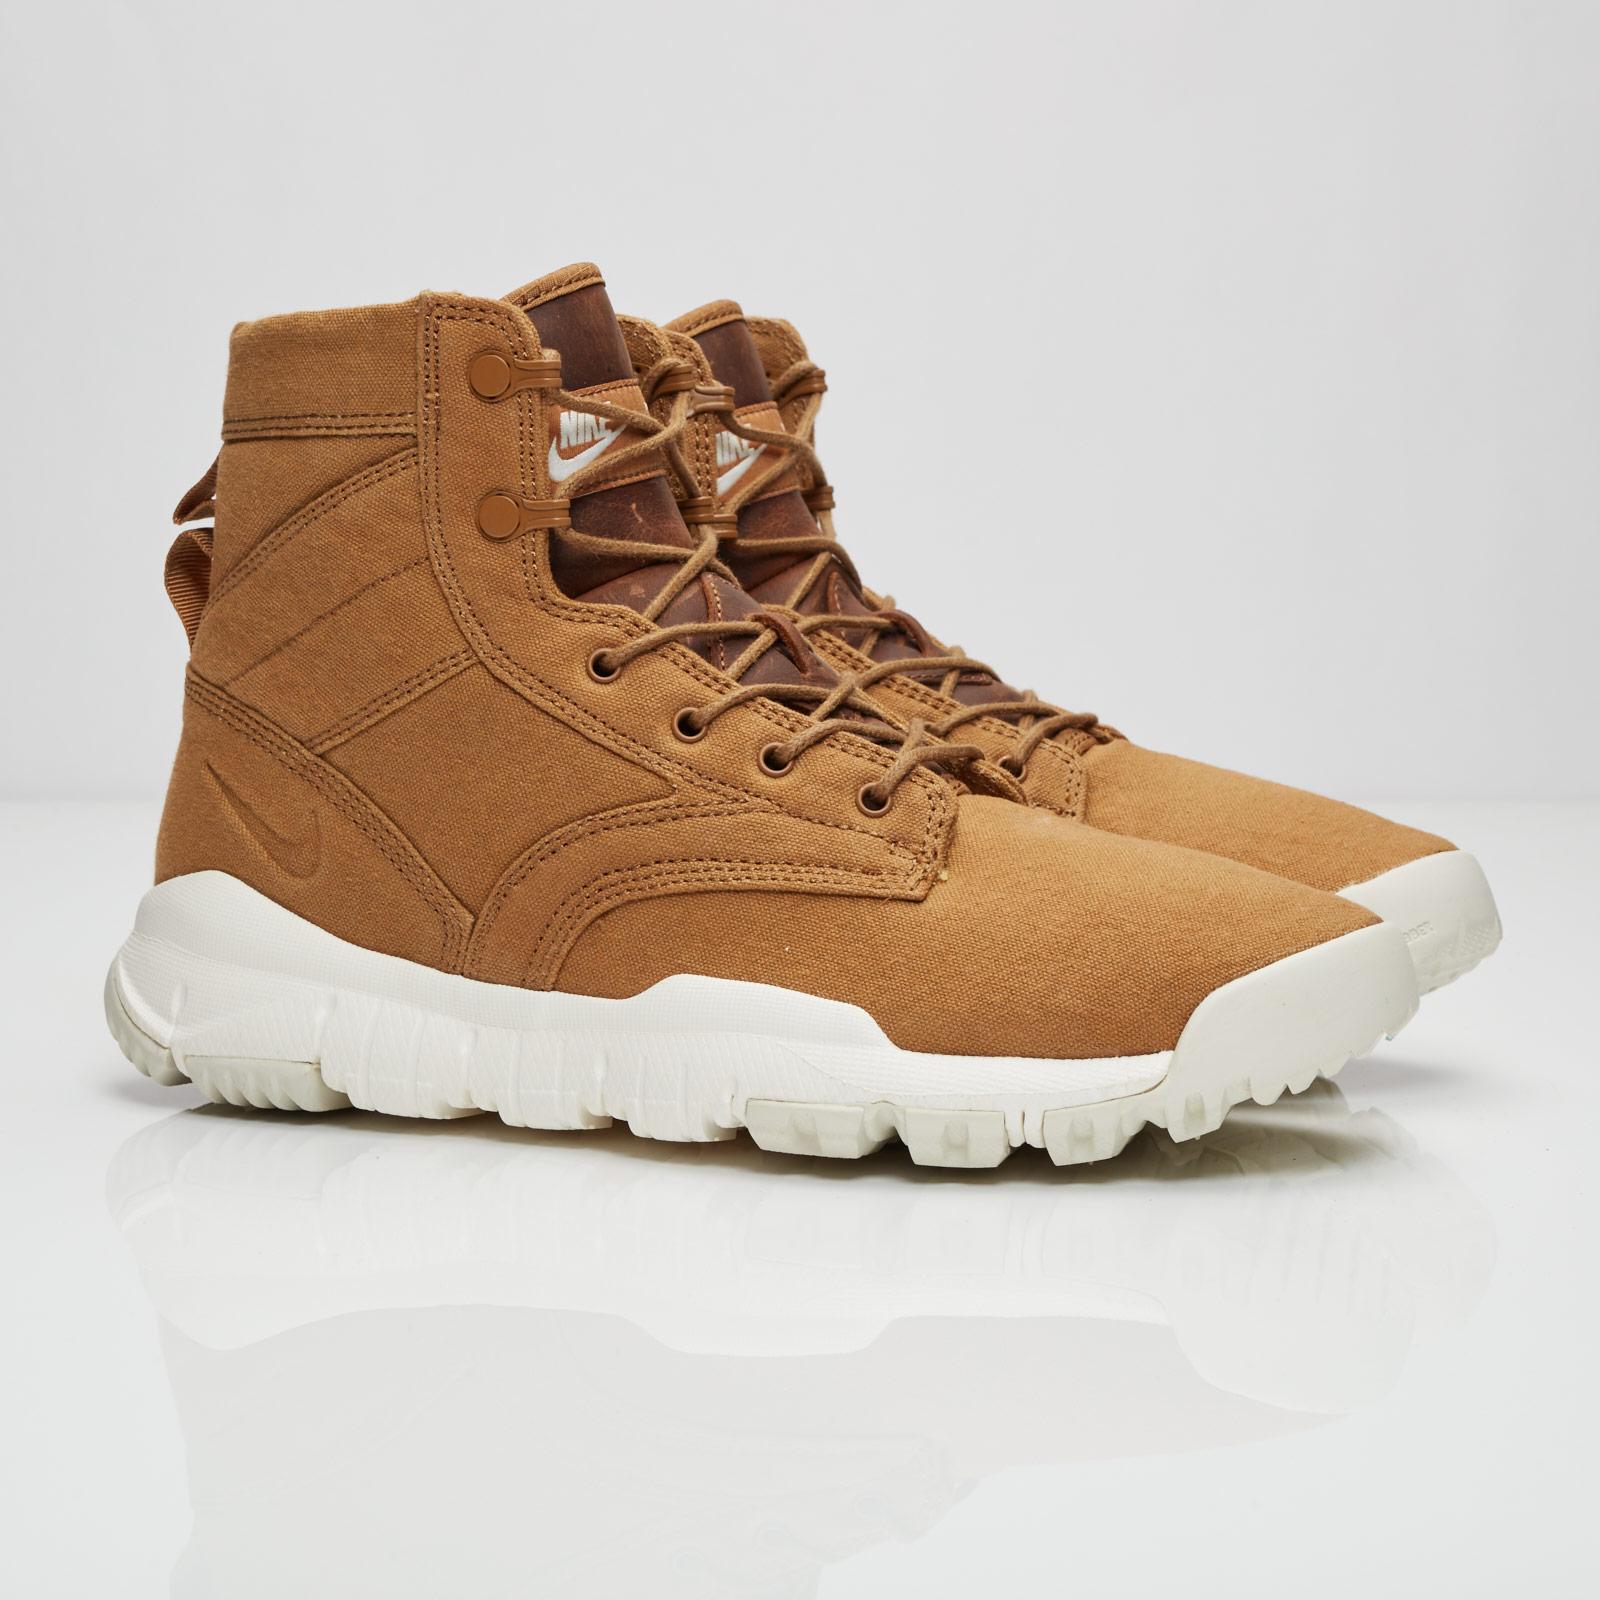 size 40 3e463 04a77 Nike SFB 6 CNVS NSW